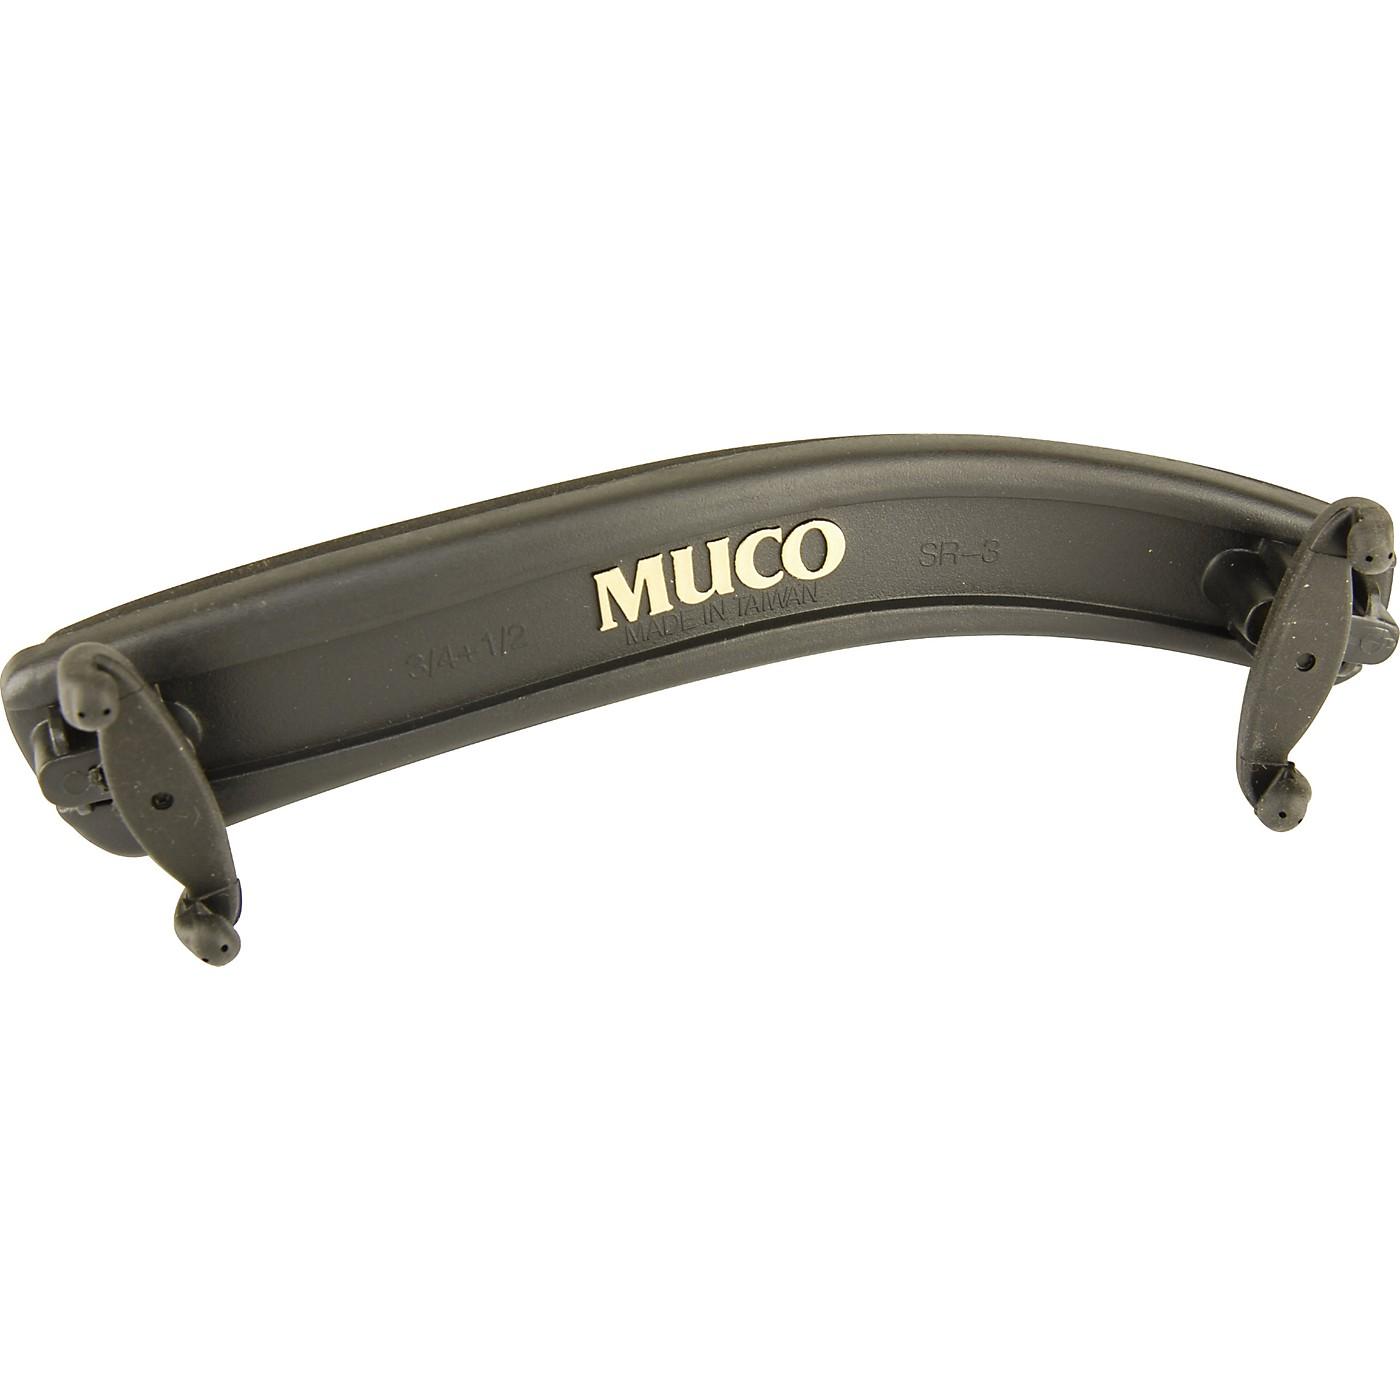 Otto Musica Muco Easy Model Shoulder Rest For Viola Muco